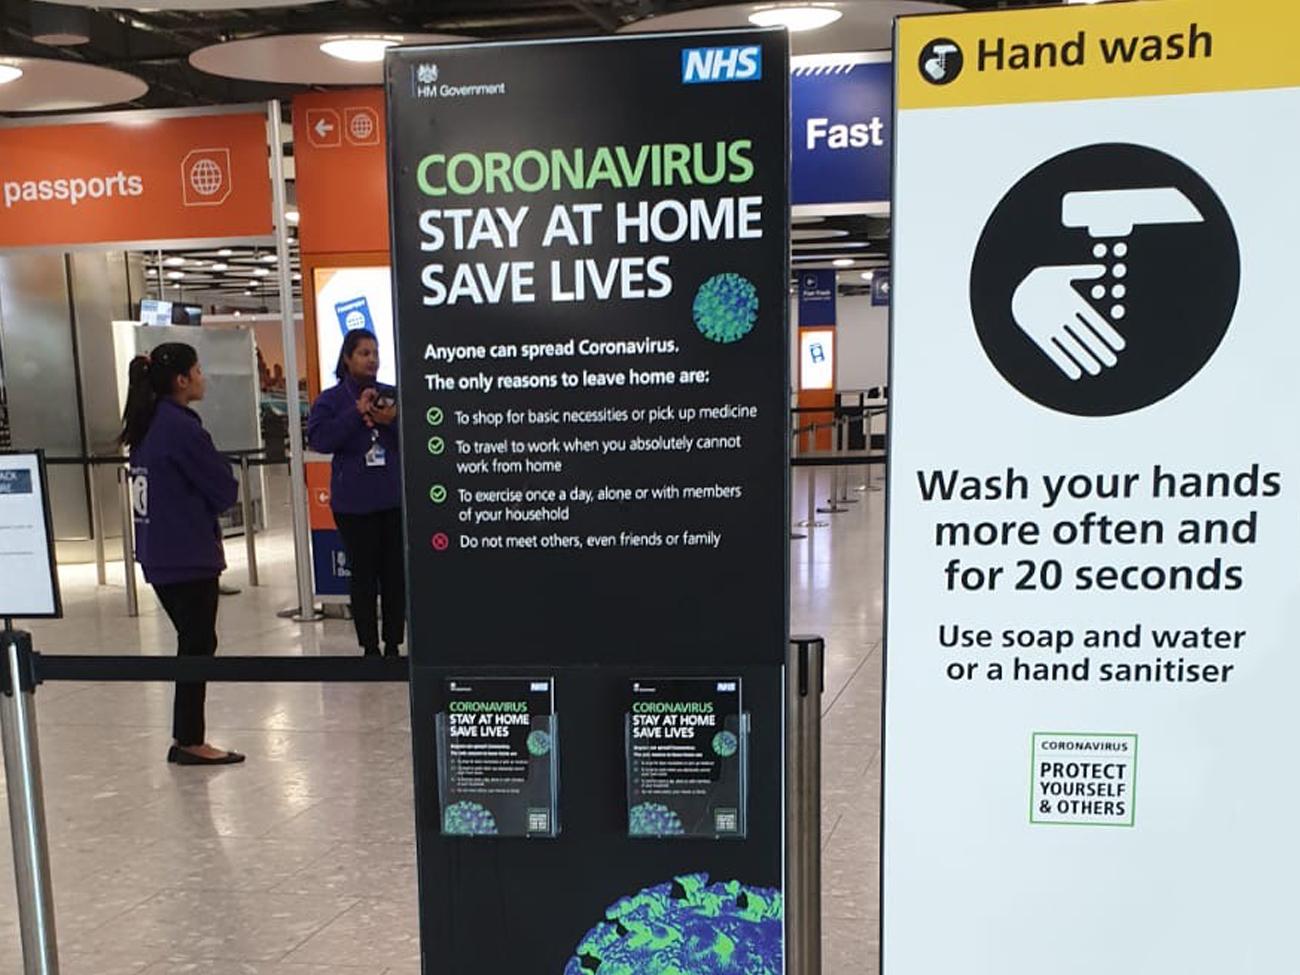 Hand wash signage